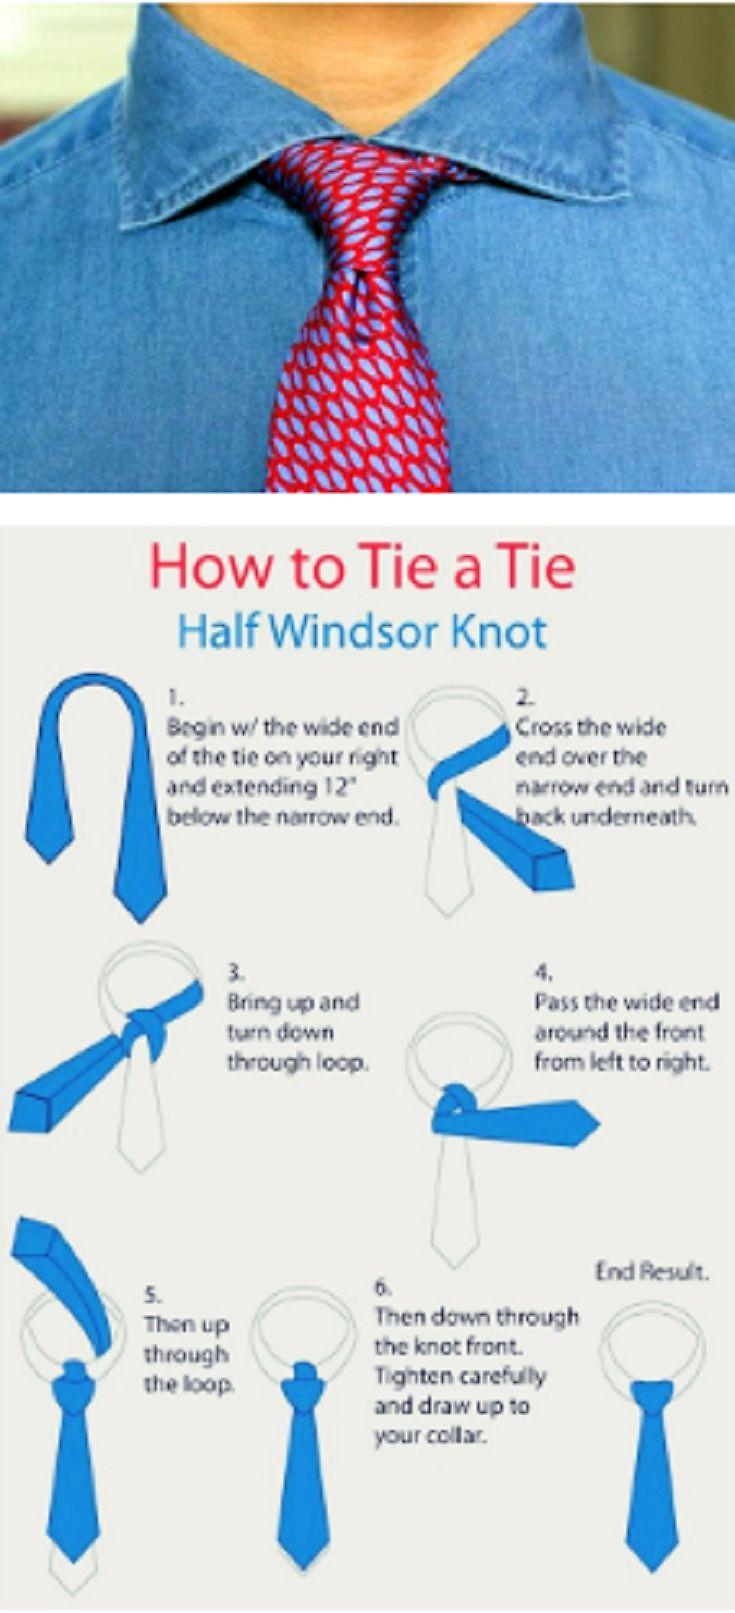 10 Most Stylish Ways To Tie A Necktie